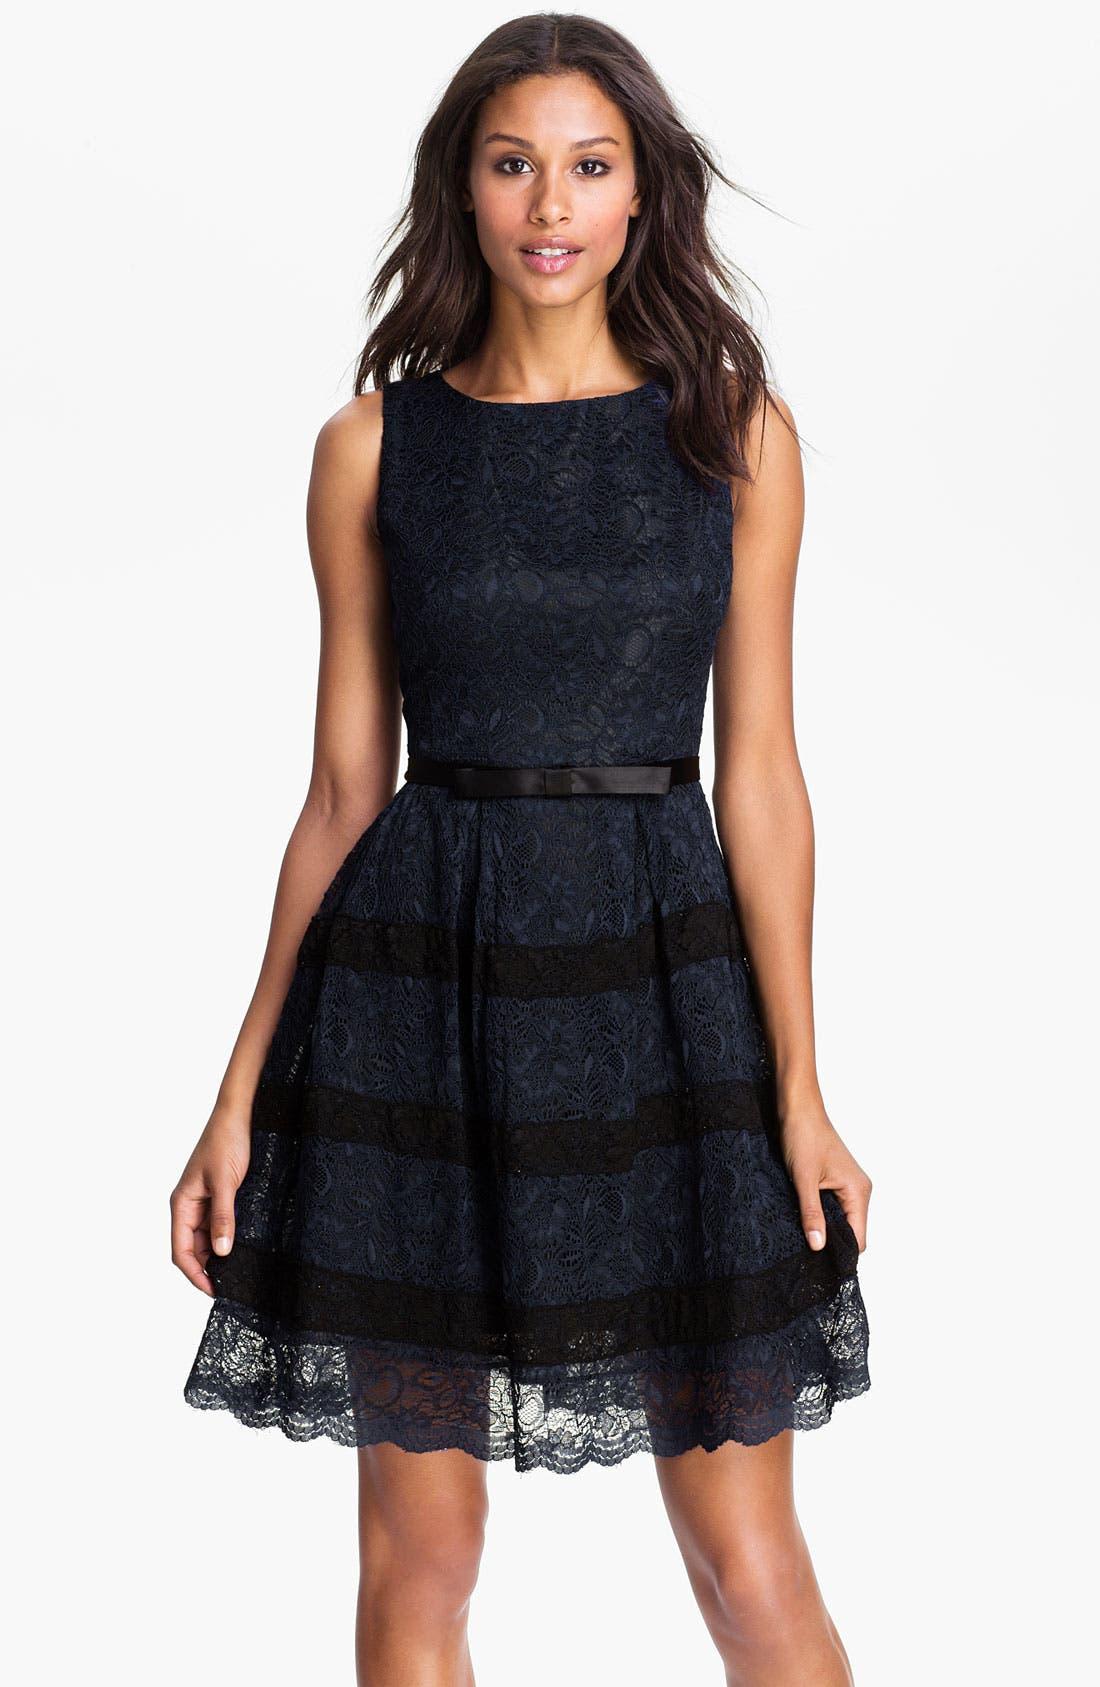 Main Image - Taylor Dresses Button Back Lace Fit & Flare Dress